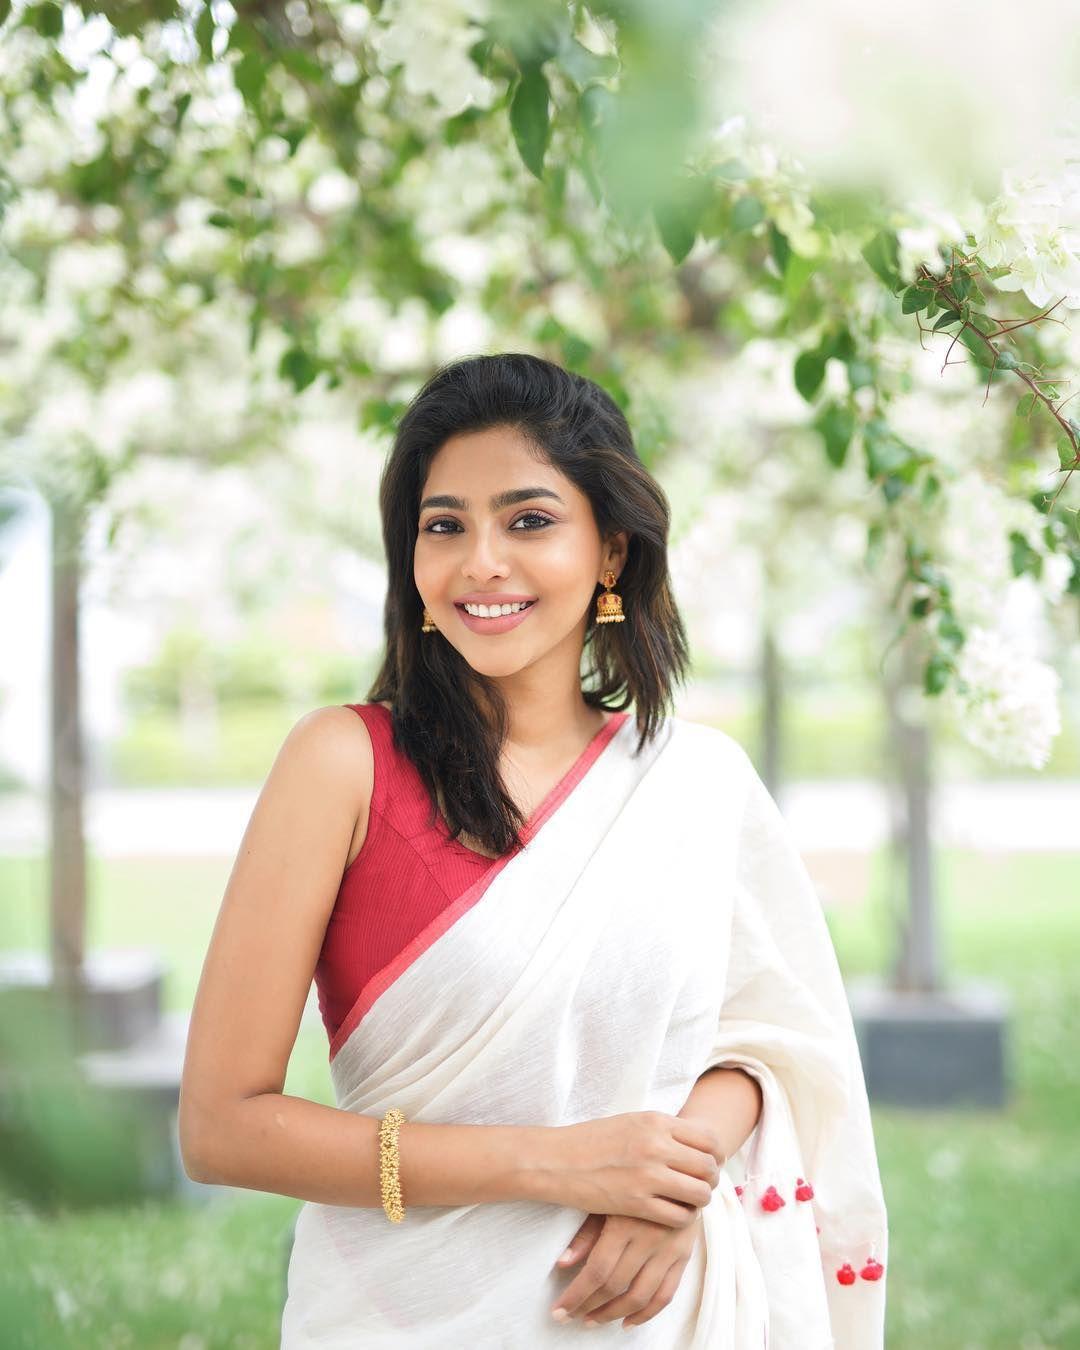 b024ae4dec Aishwarya Lekshmi traditional sleeveless Saree and Medium length hairstyle